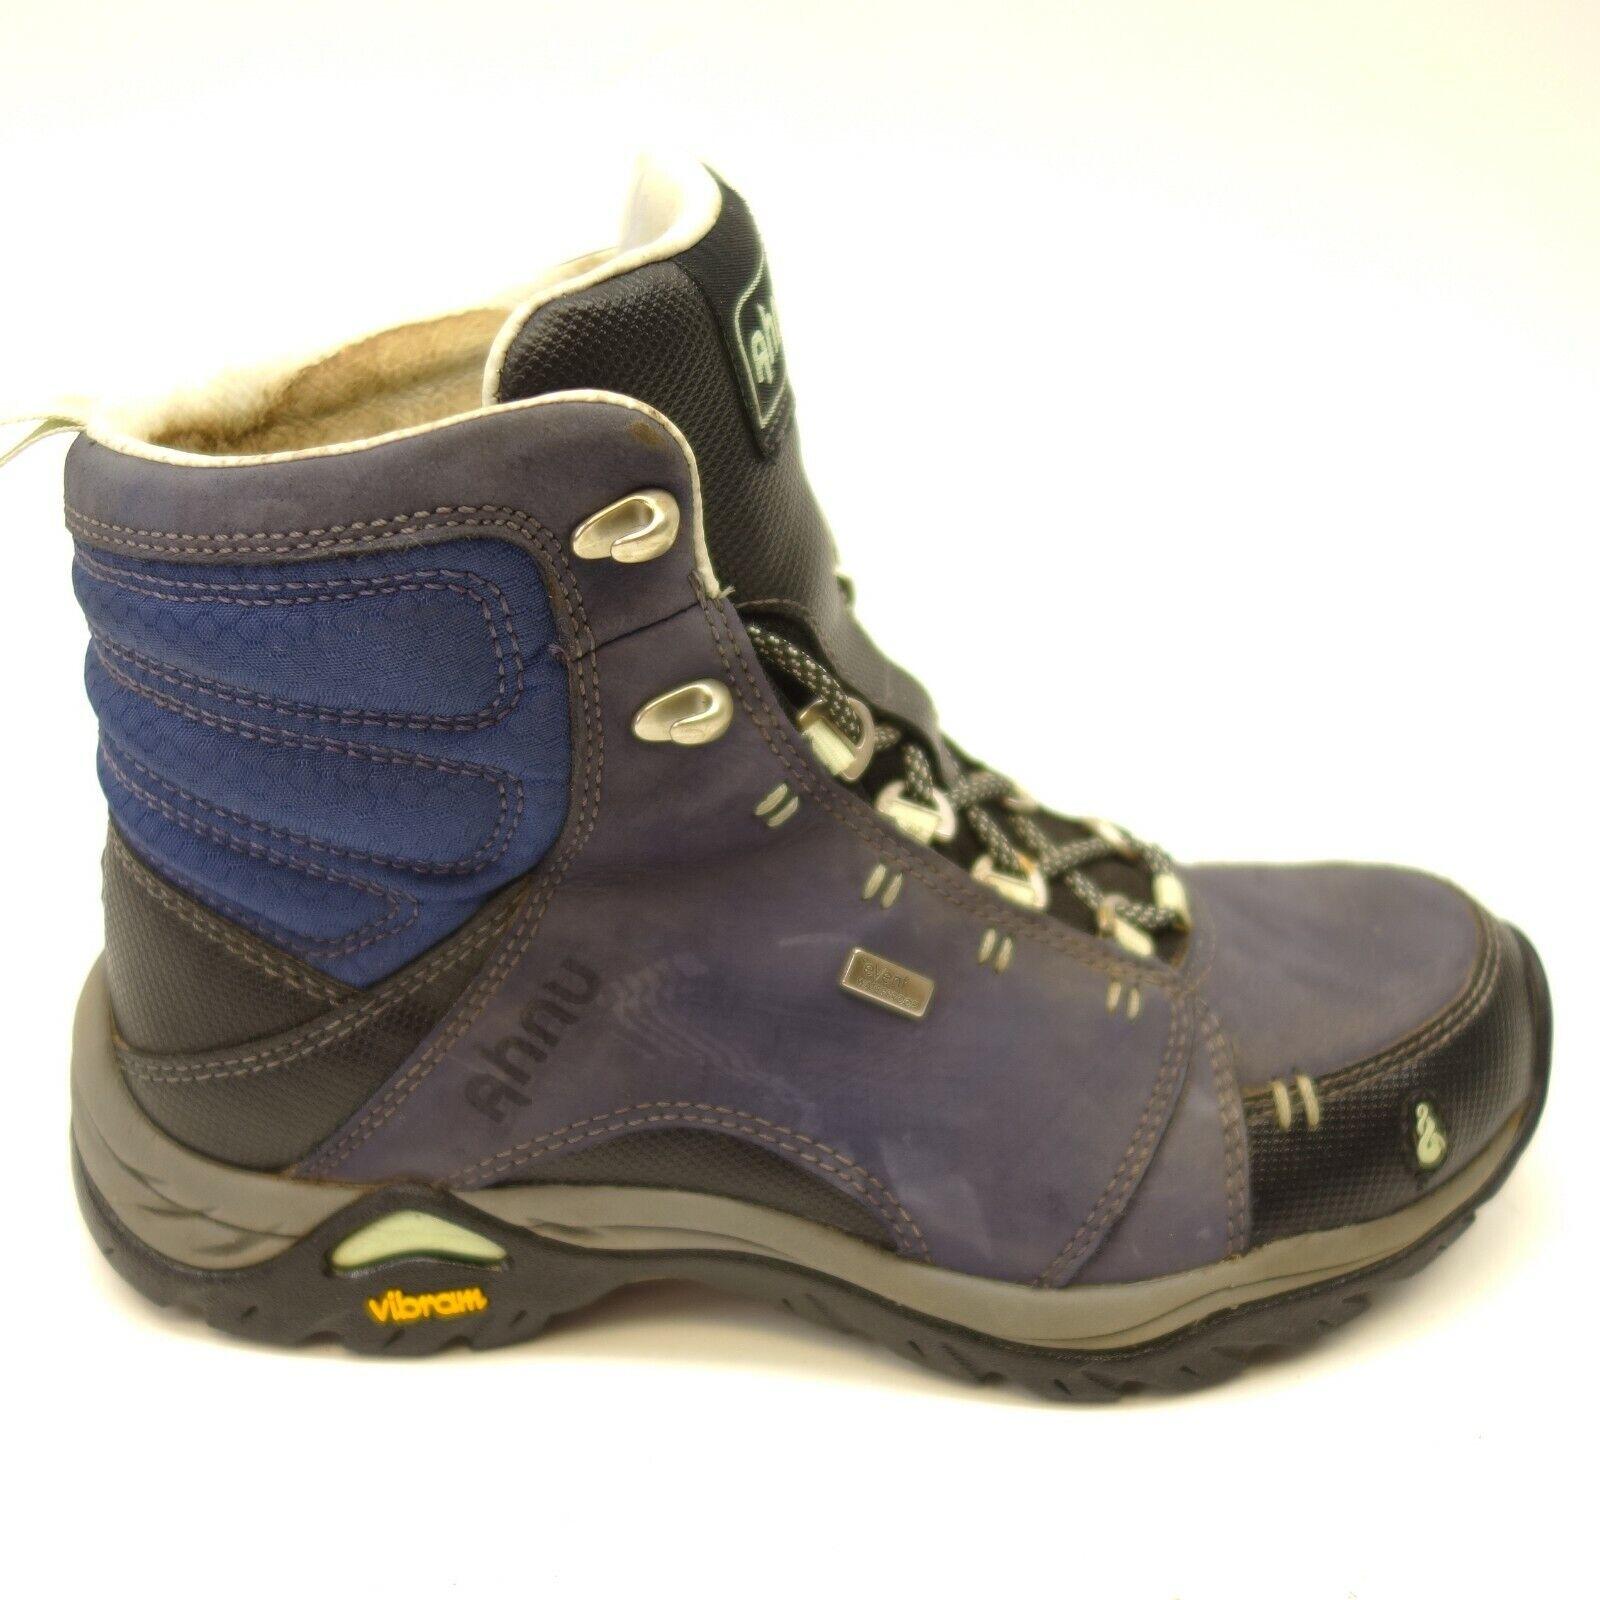 Ahnu Montara WP US 6 Eu 37 Athletic Trail Hiking Cushioned Mid Womens Boots